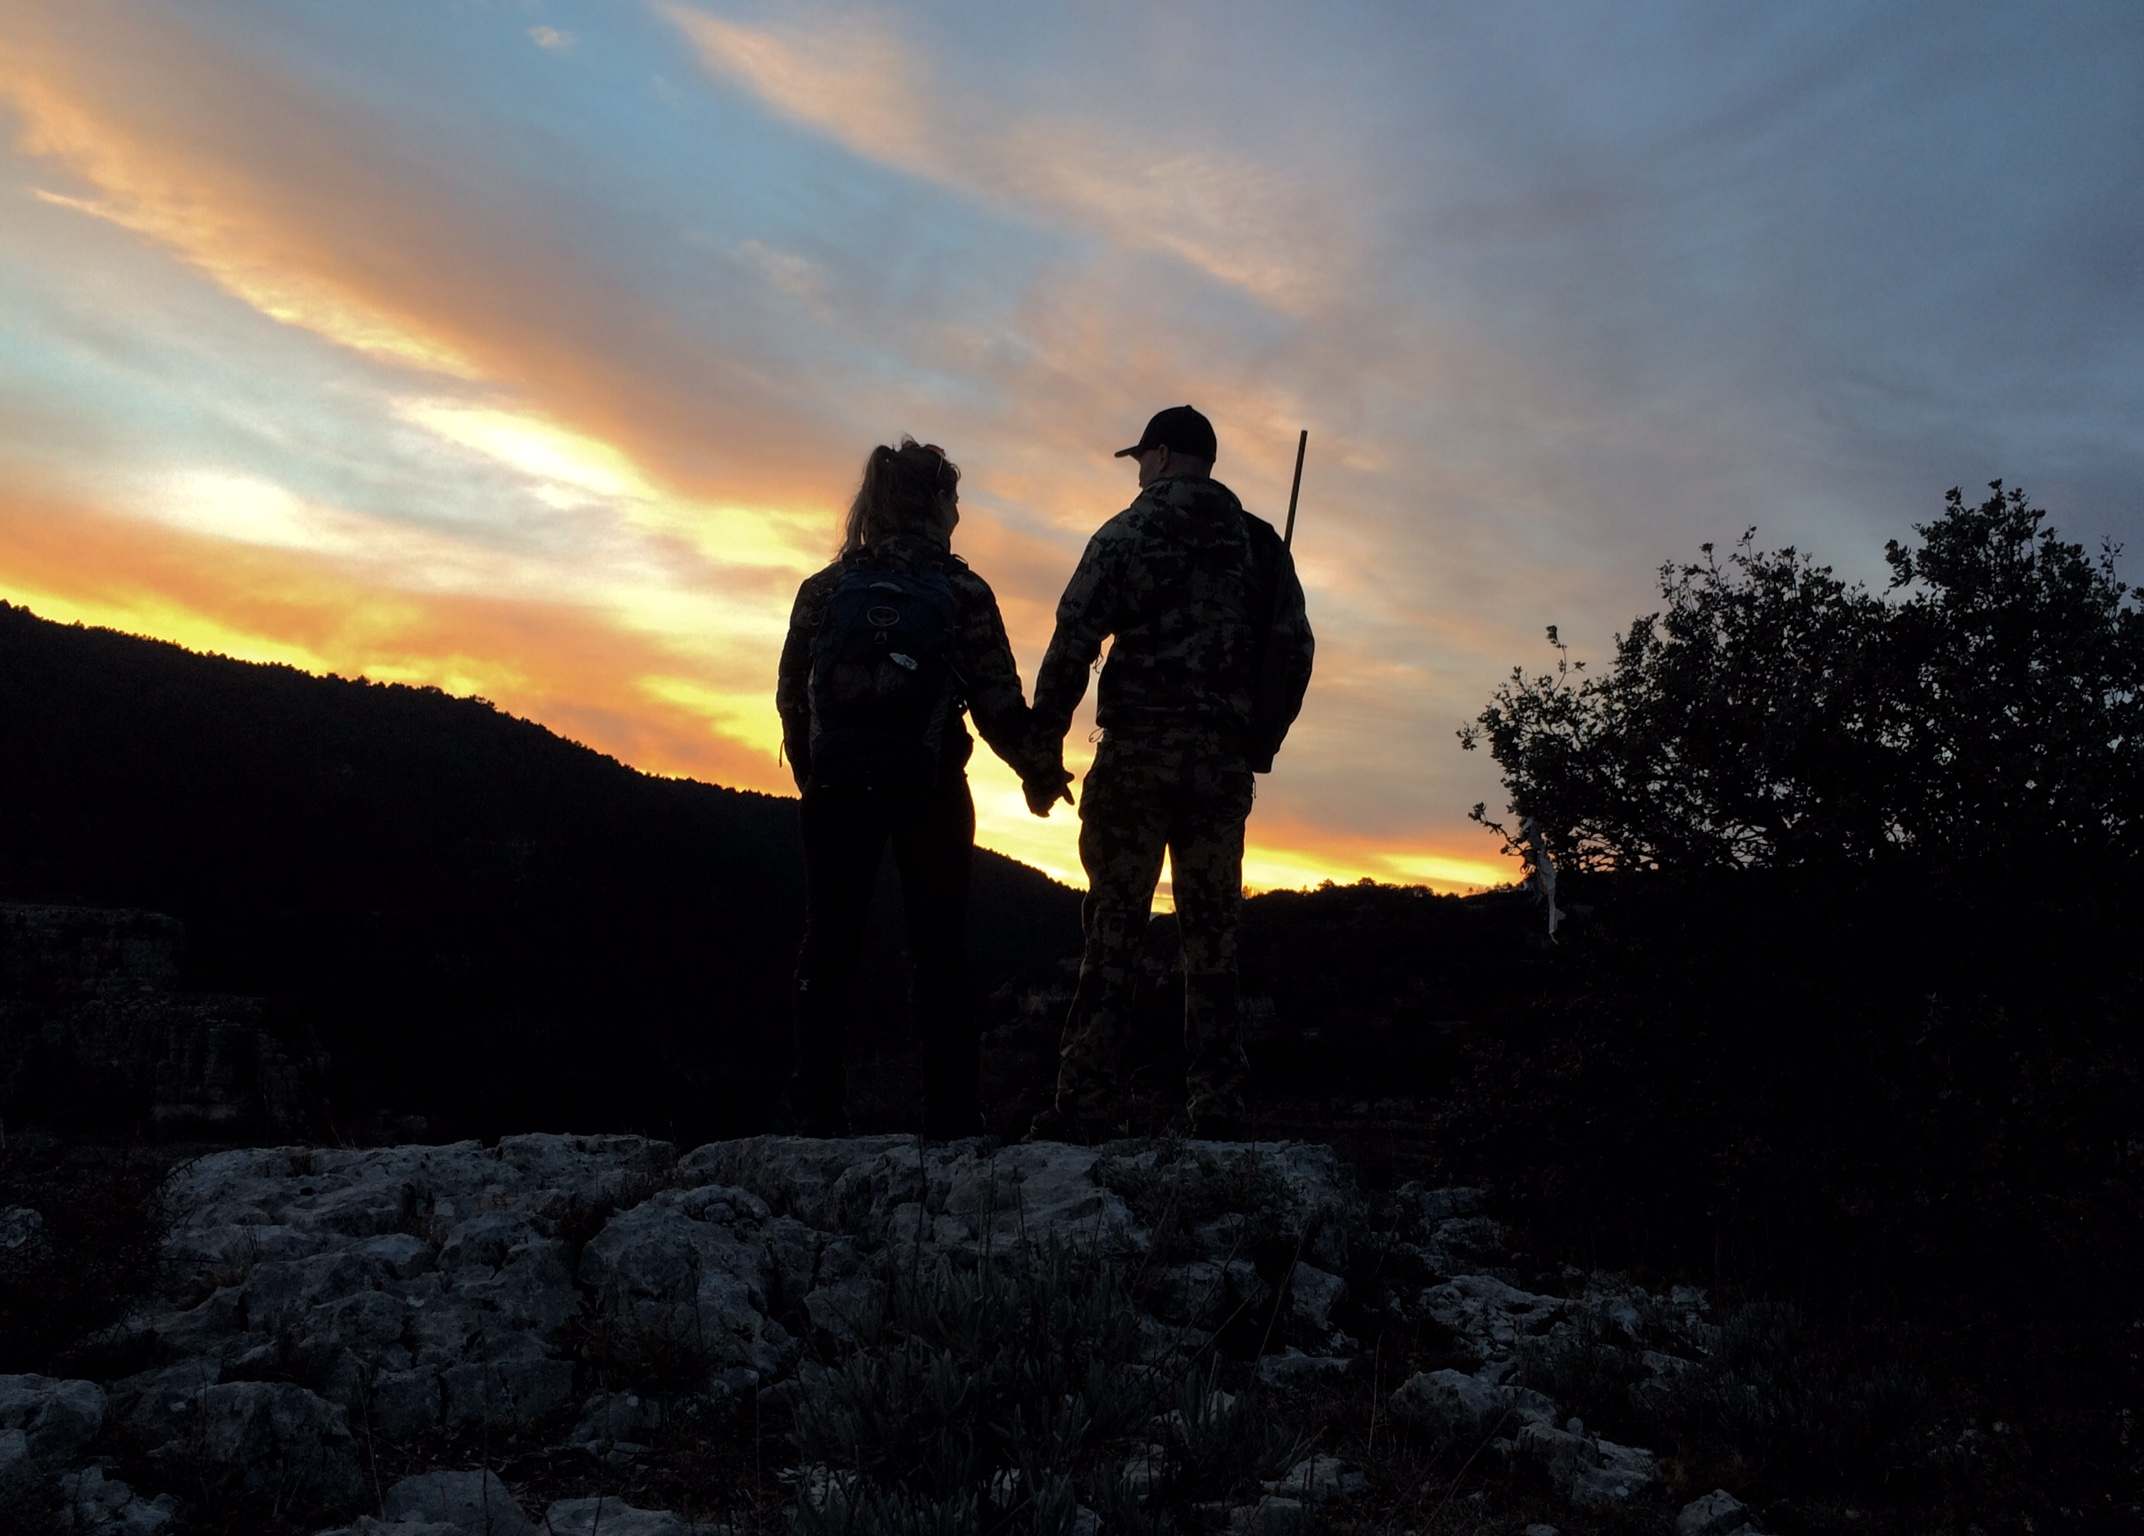 Lov na slikama i videu - Page 2 Kyle-and-Heidi-hunting-in-the-sunset